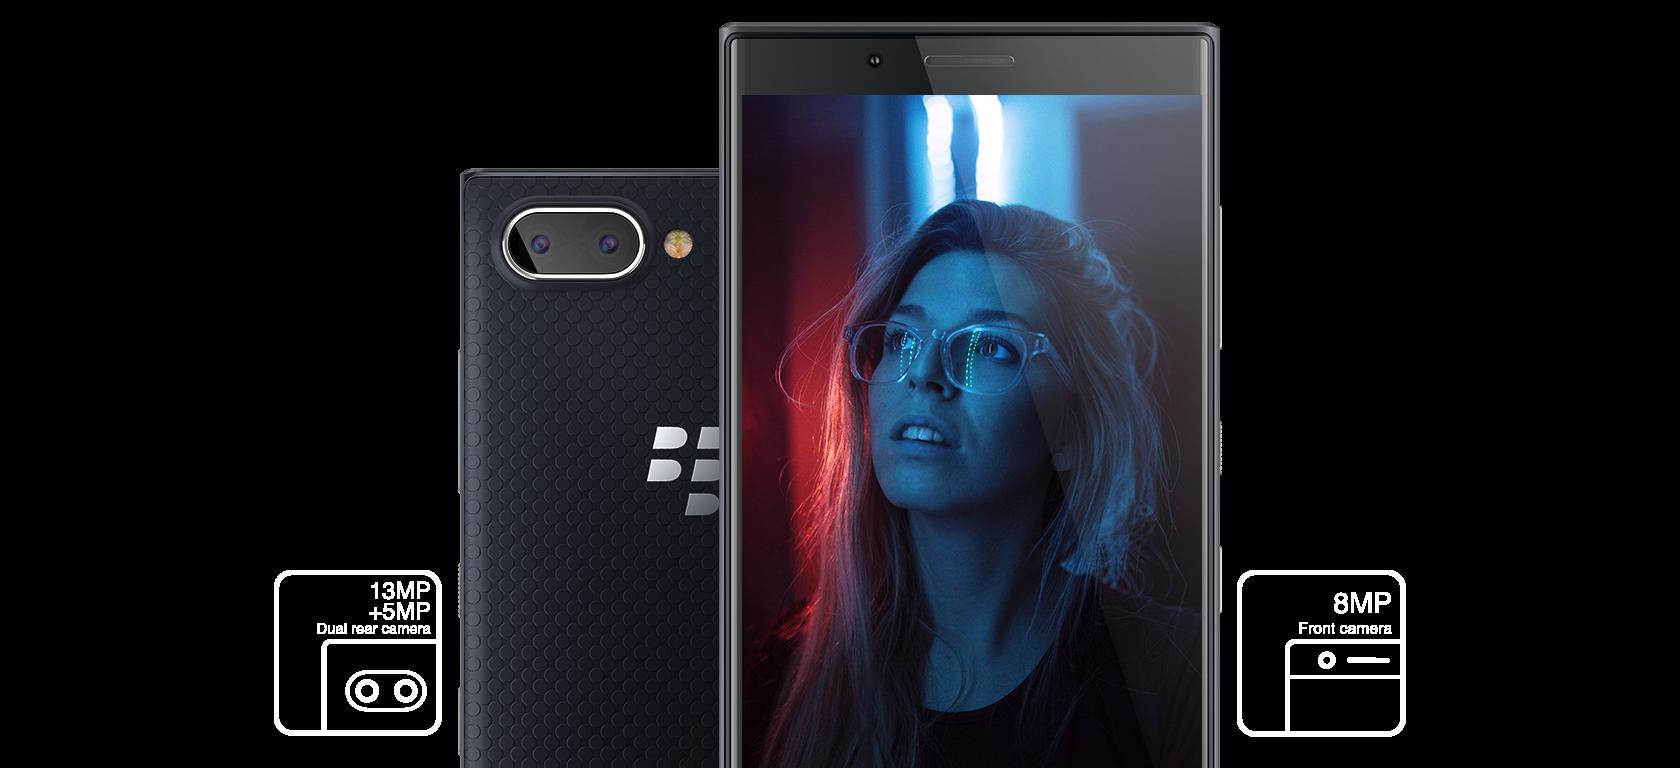 Dual Camera on Blackberry Key 2 LE